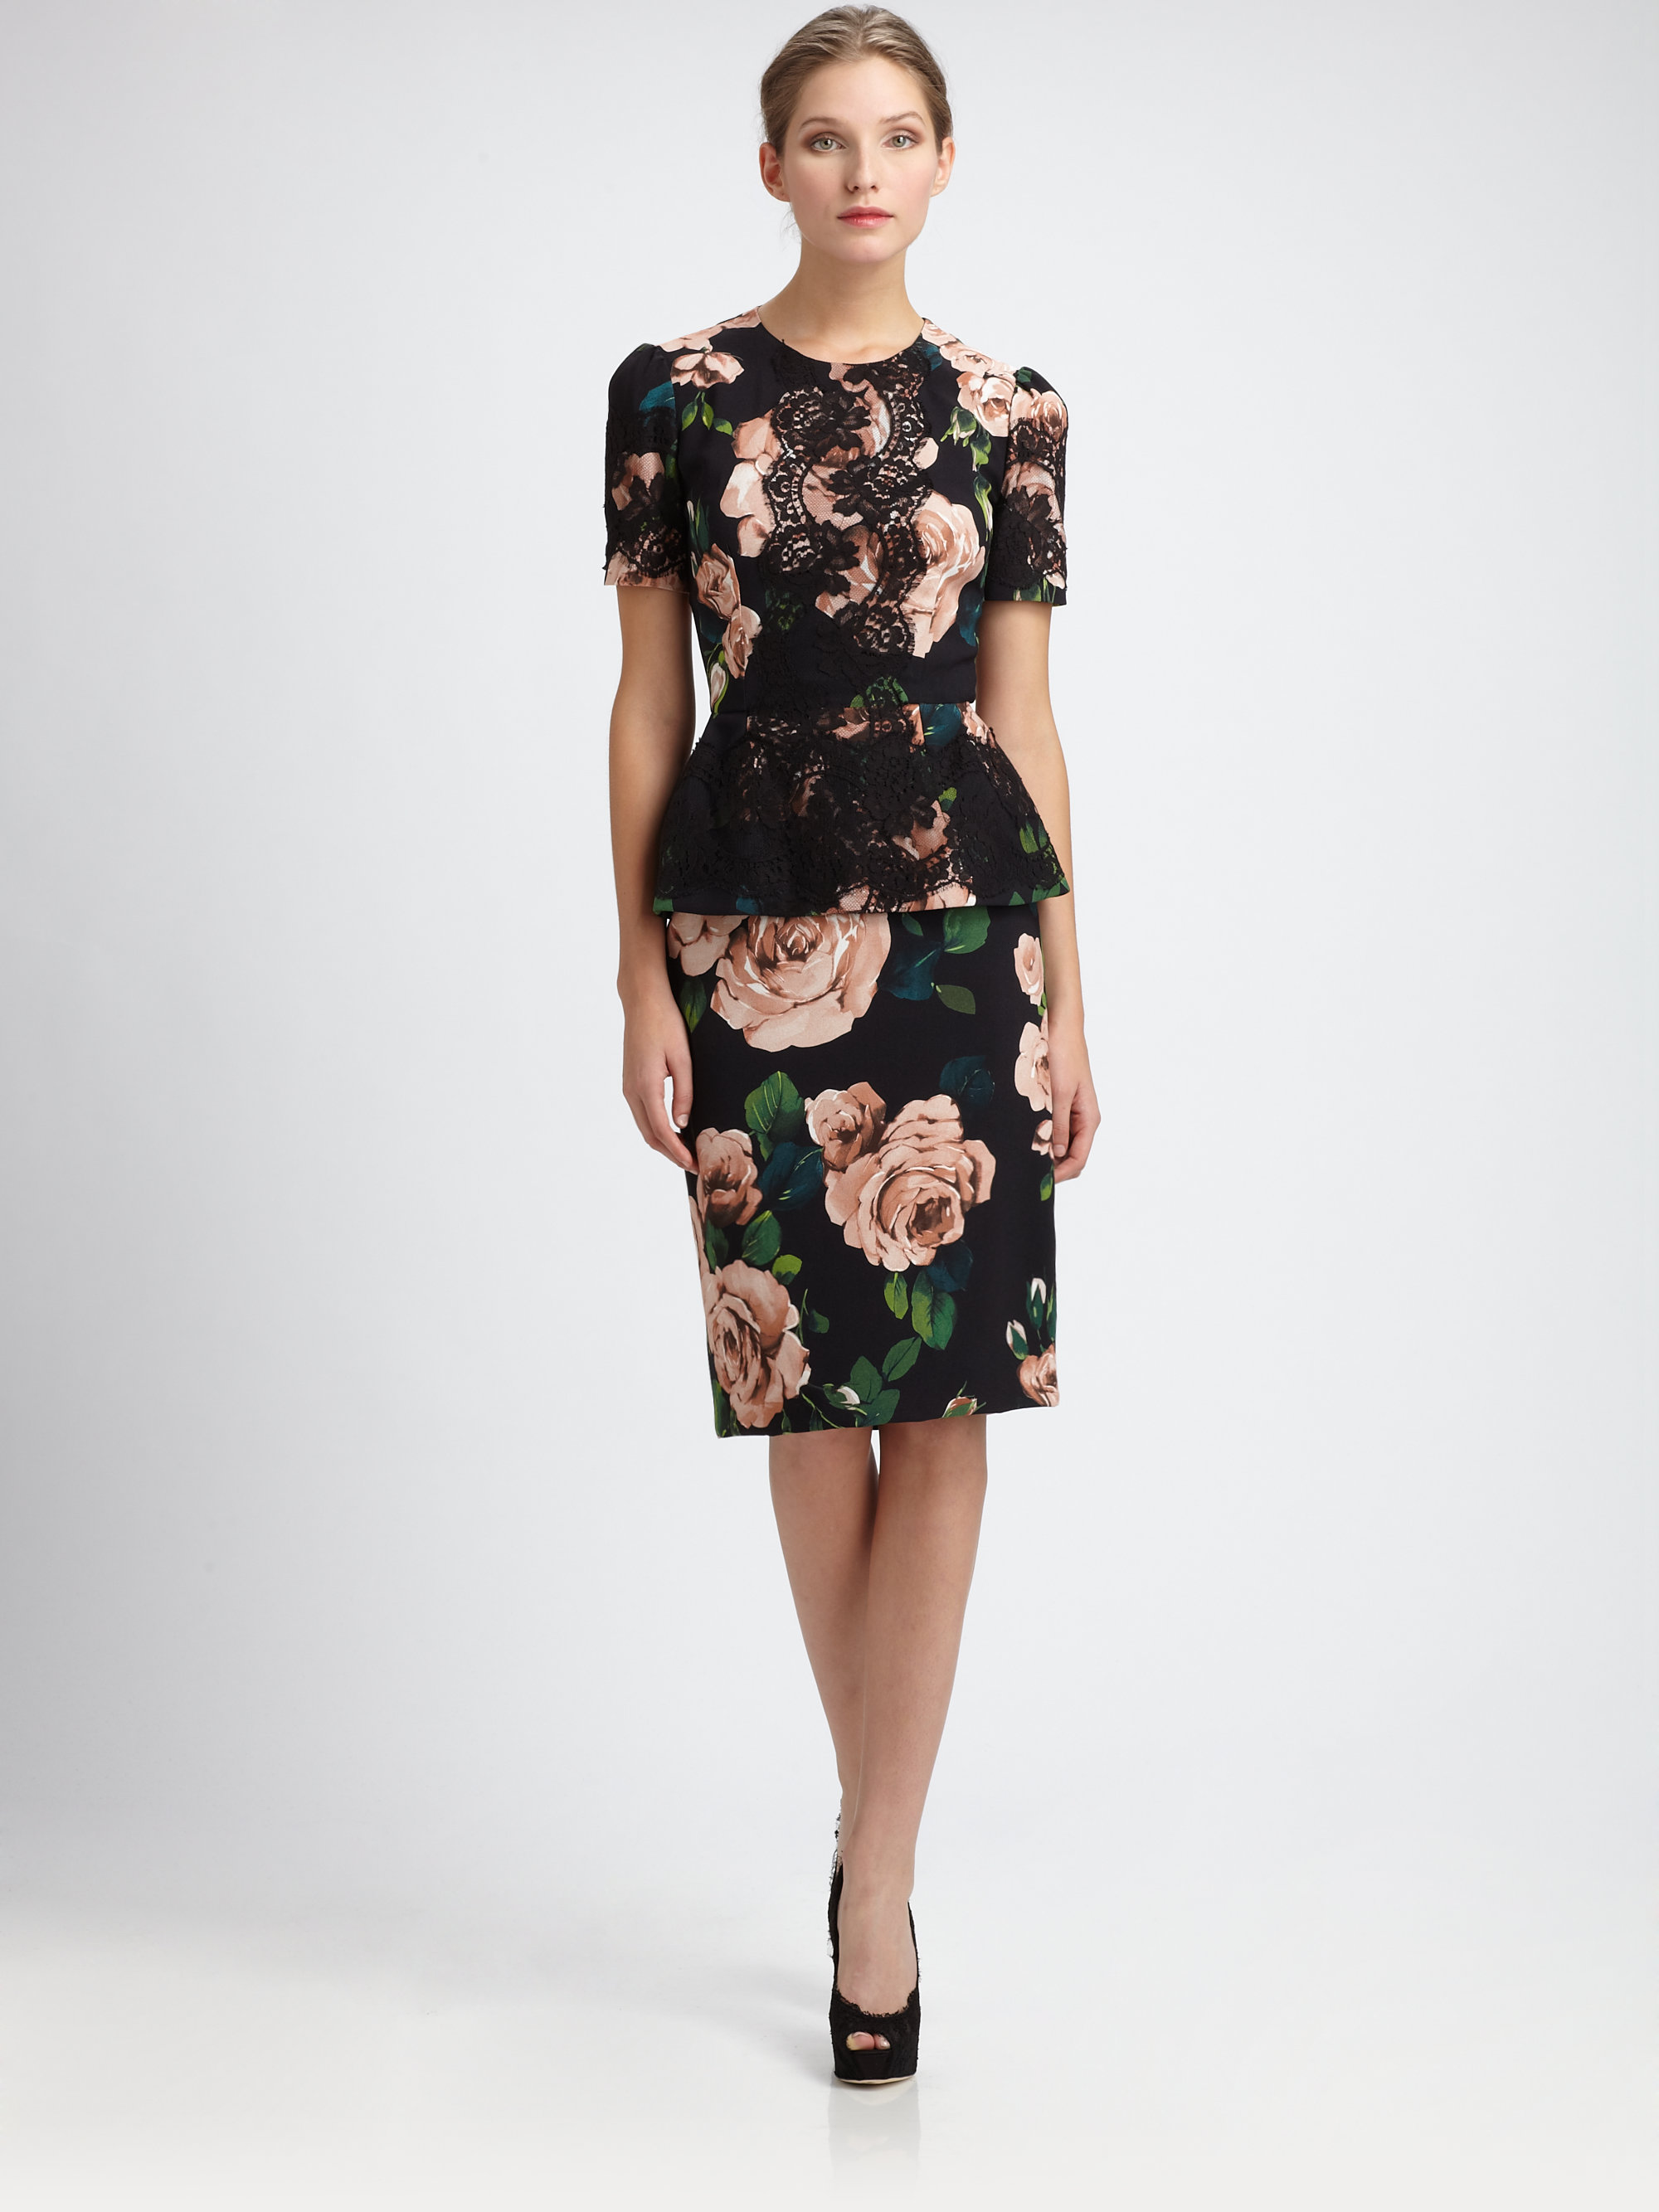 Dolce & gabbana Floral Pencil Skirt | Lyst